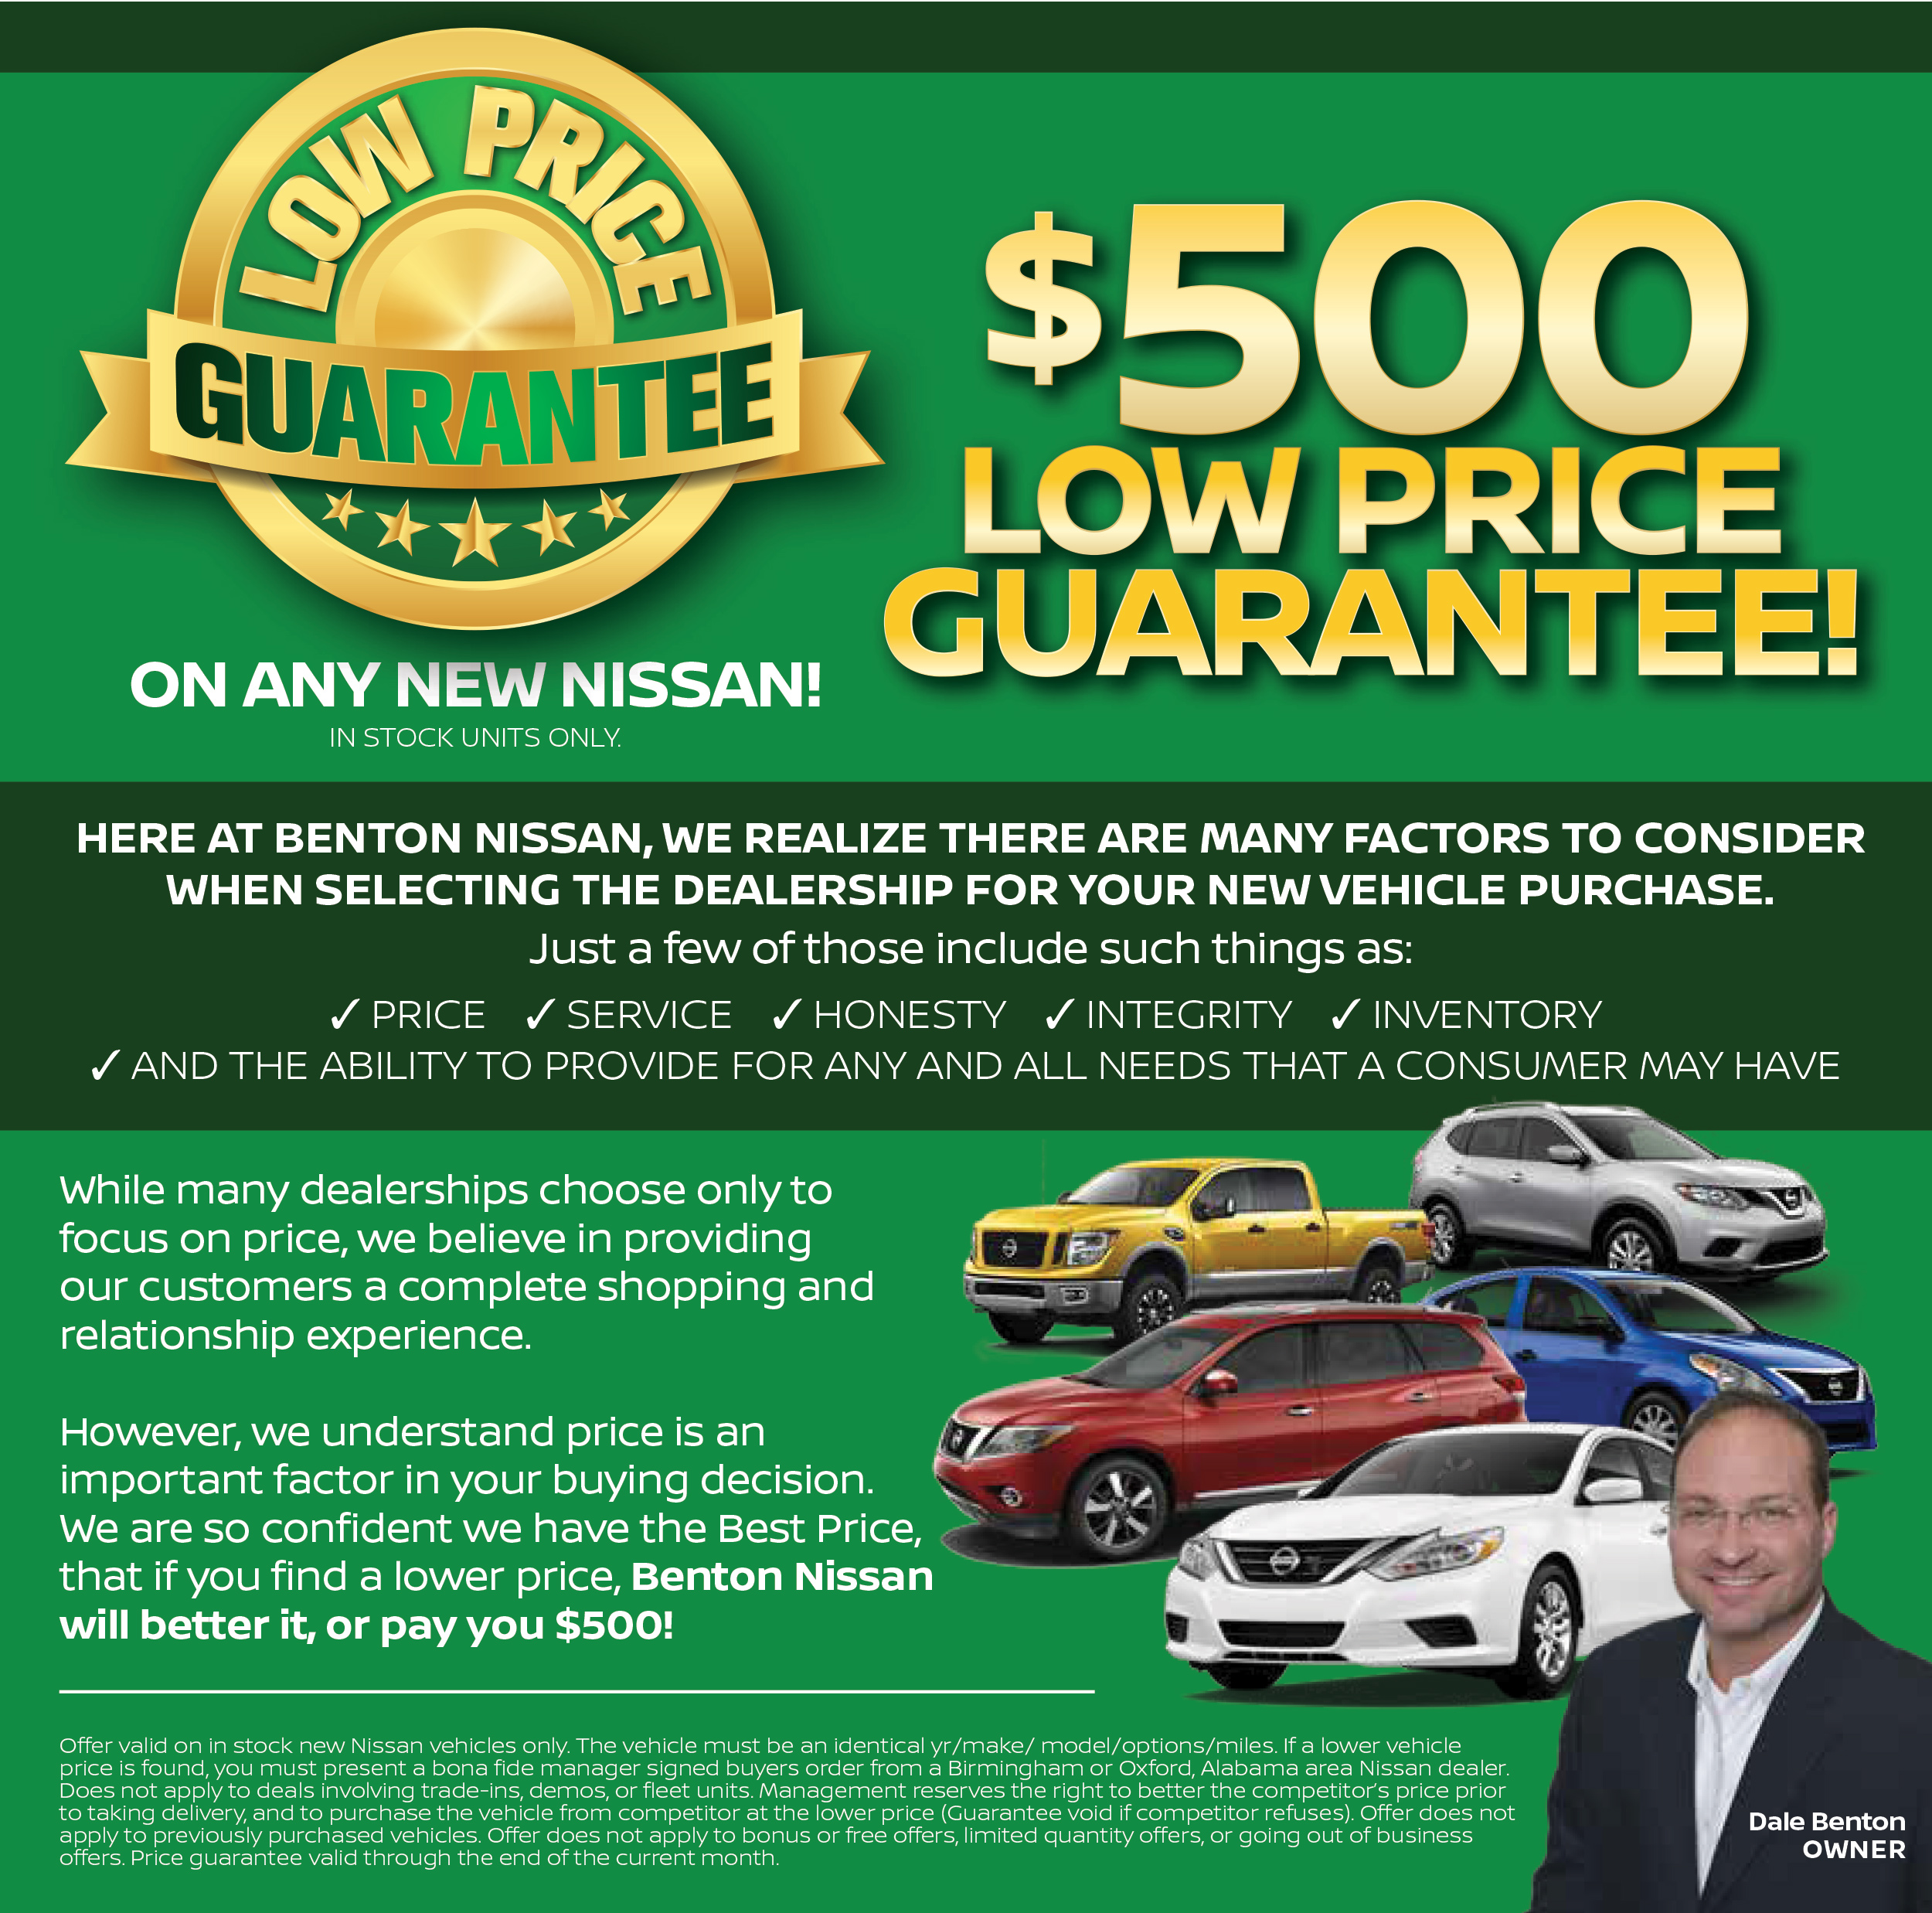 Benton Nissan Hoover >> Low Price Guarantee for Nissan   Benton of Hoover, AL